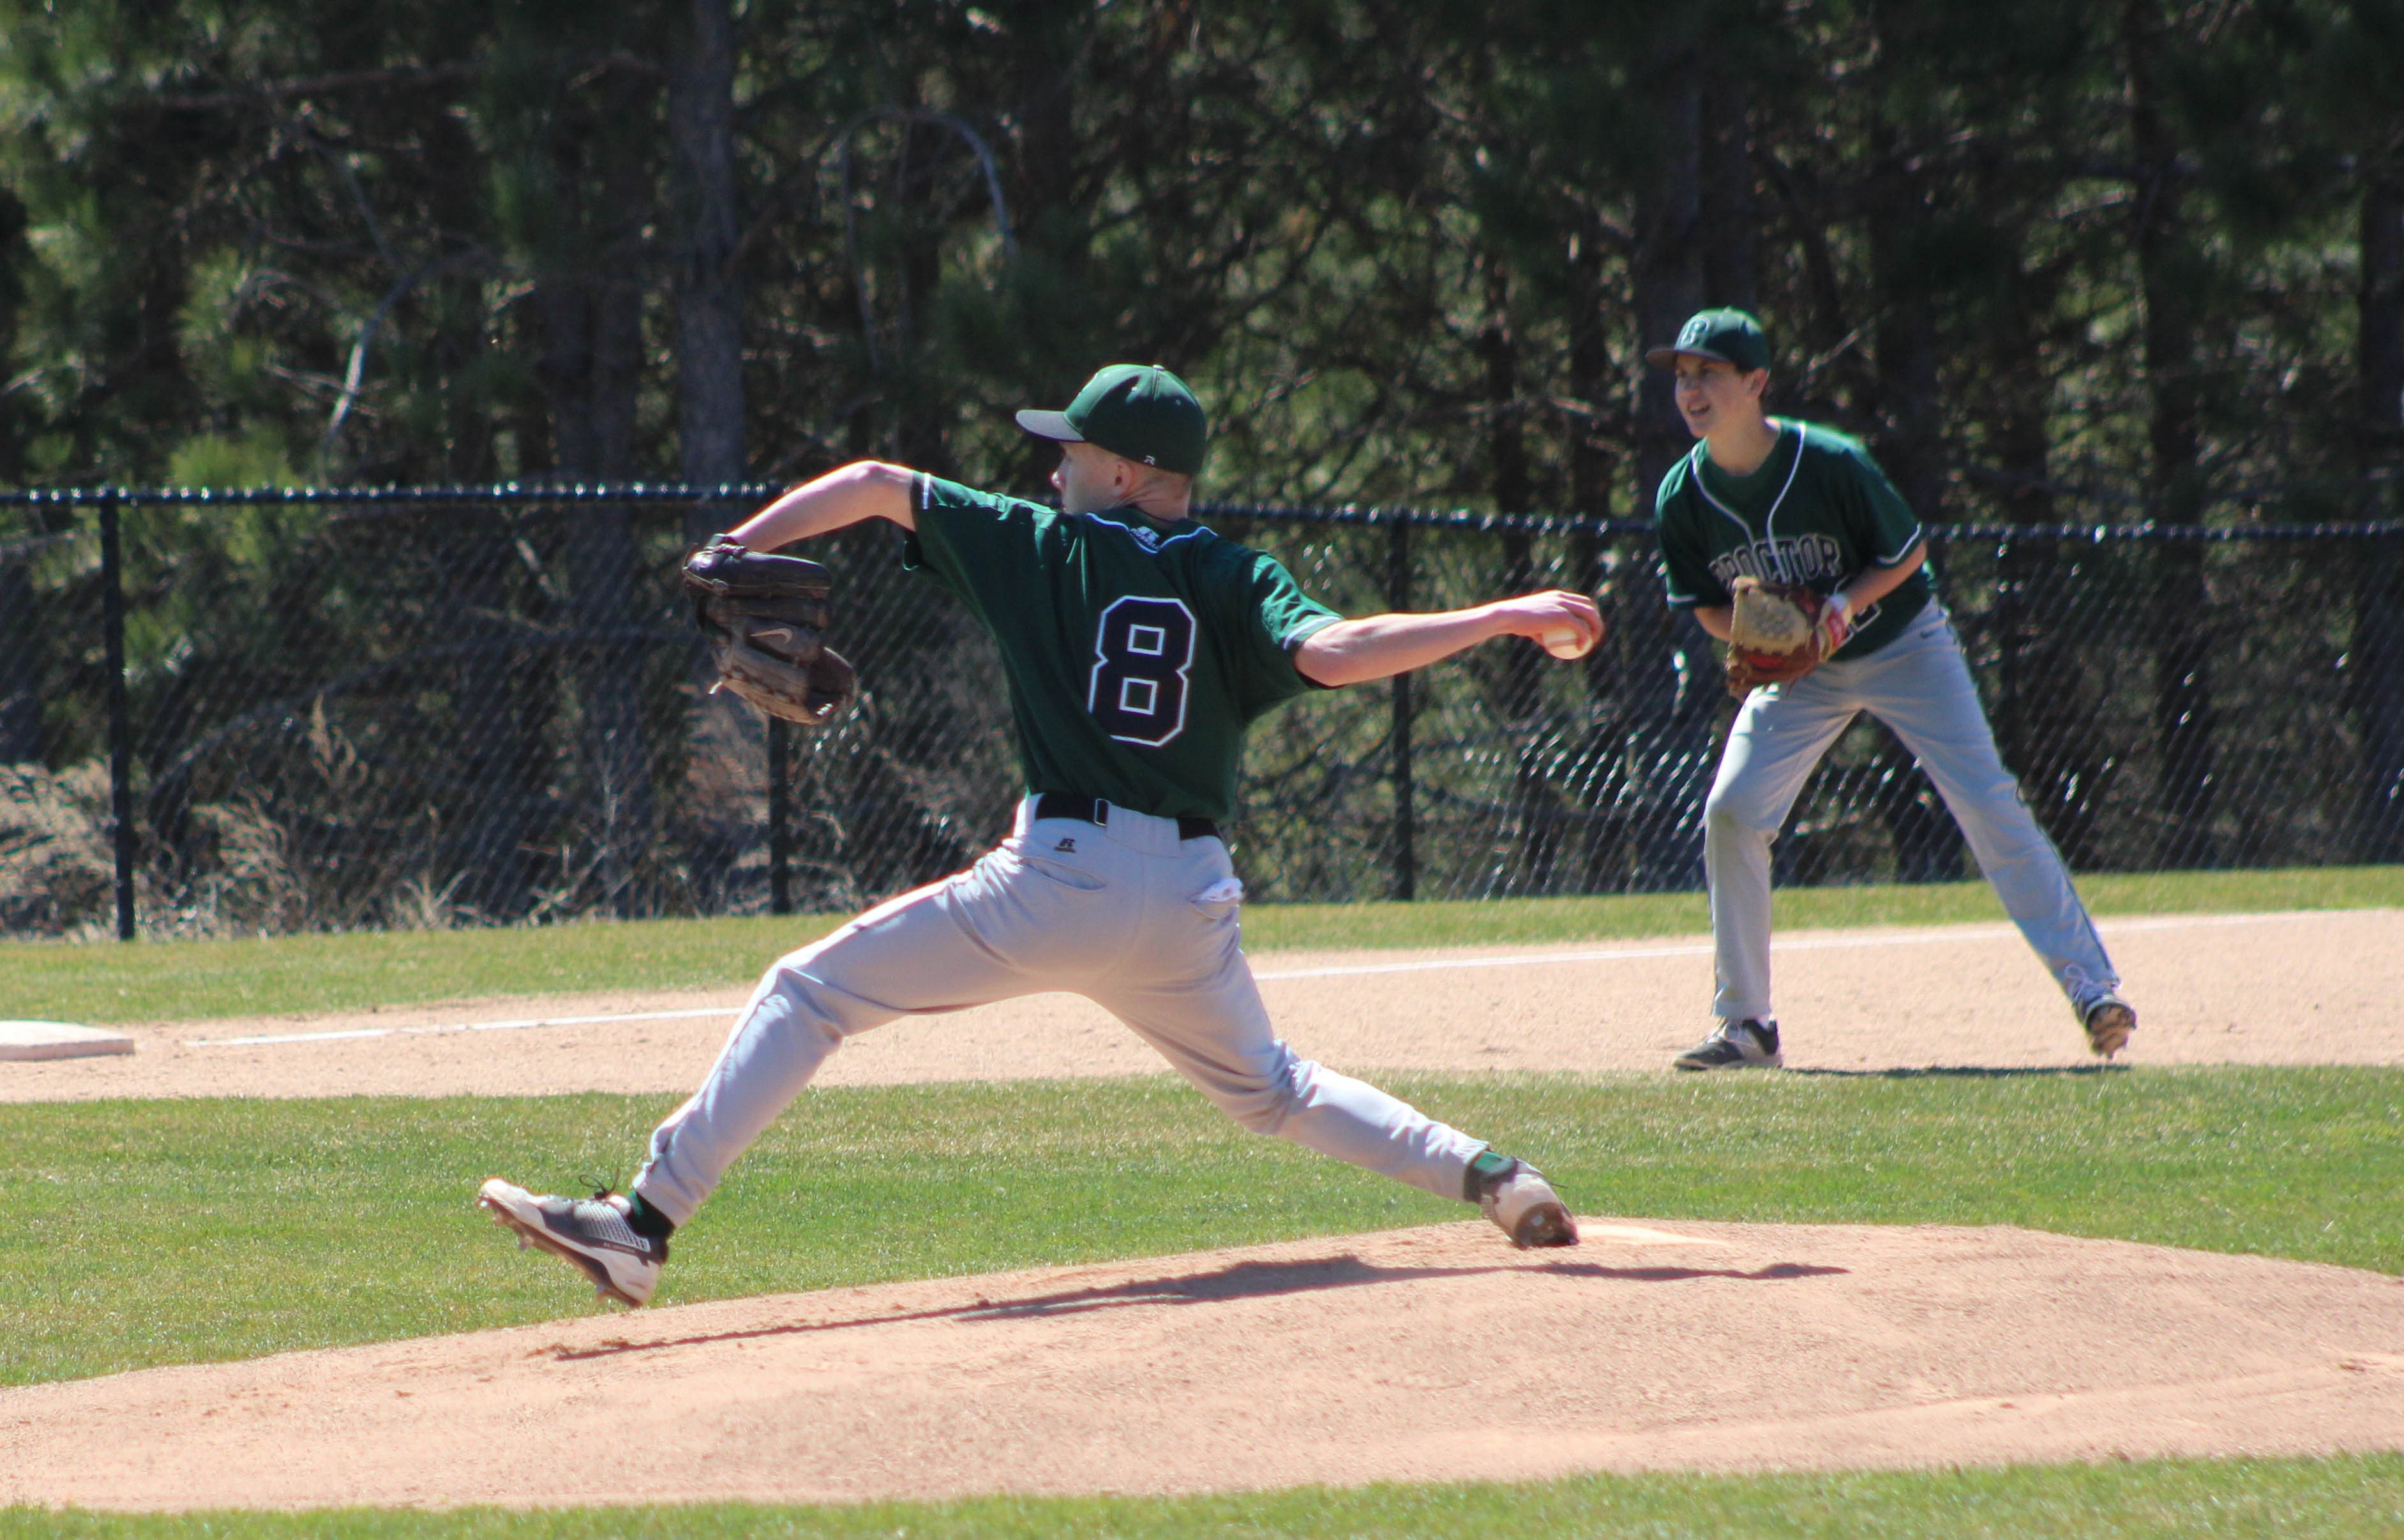 Proctor Academy baseball